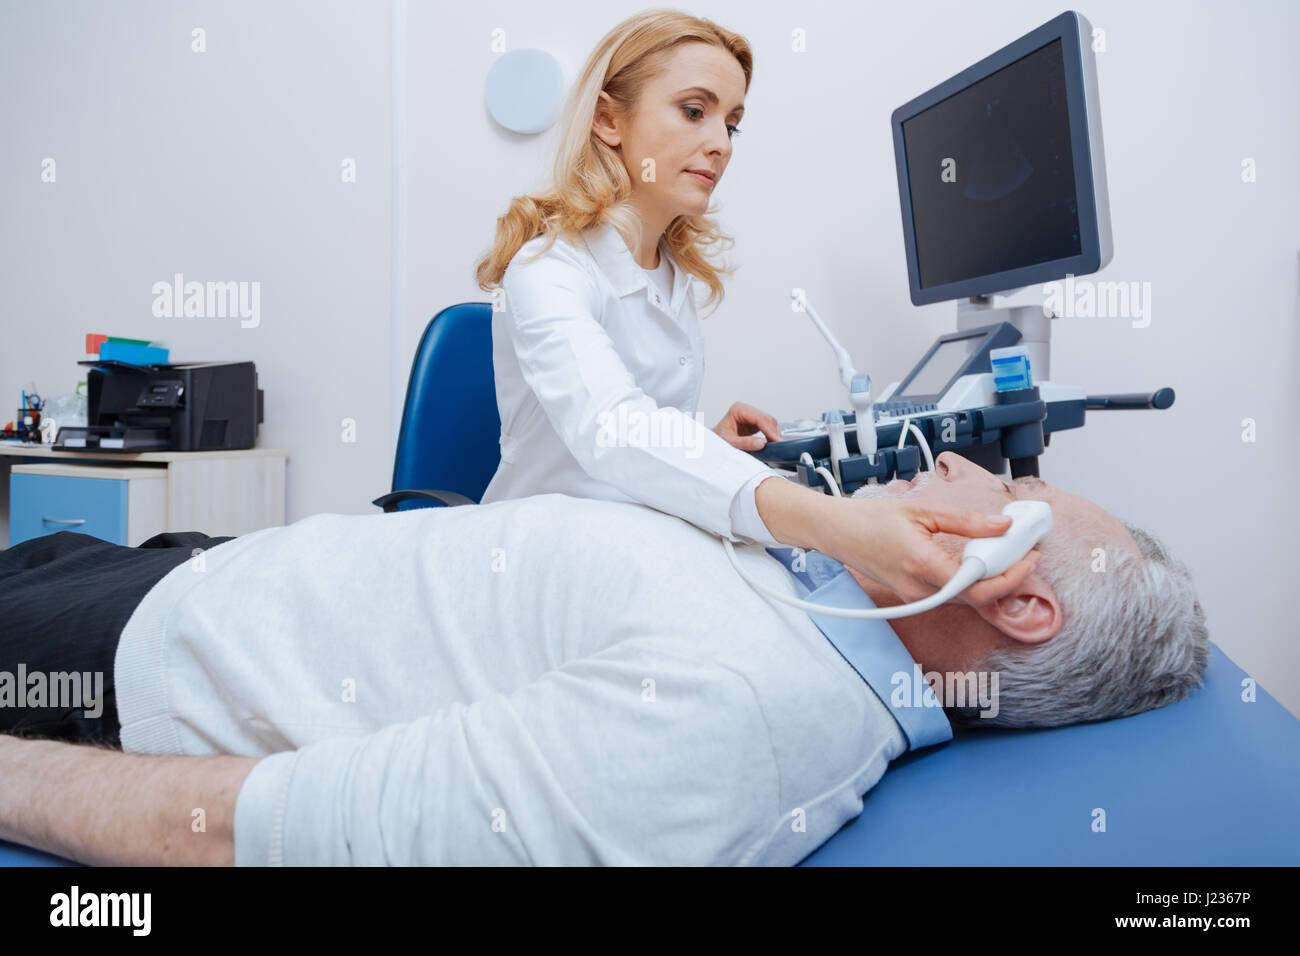 Female sonographer providing brain ultrasound in the hospital - Stock Image